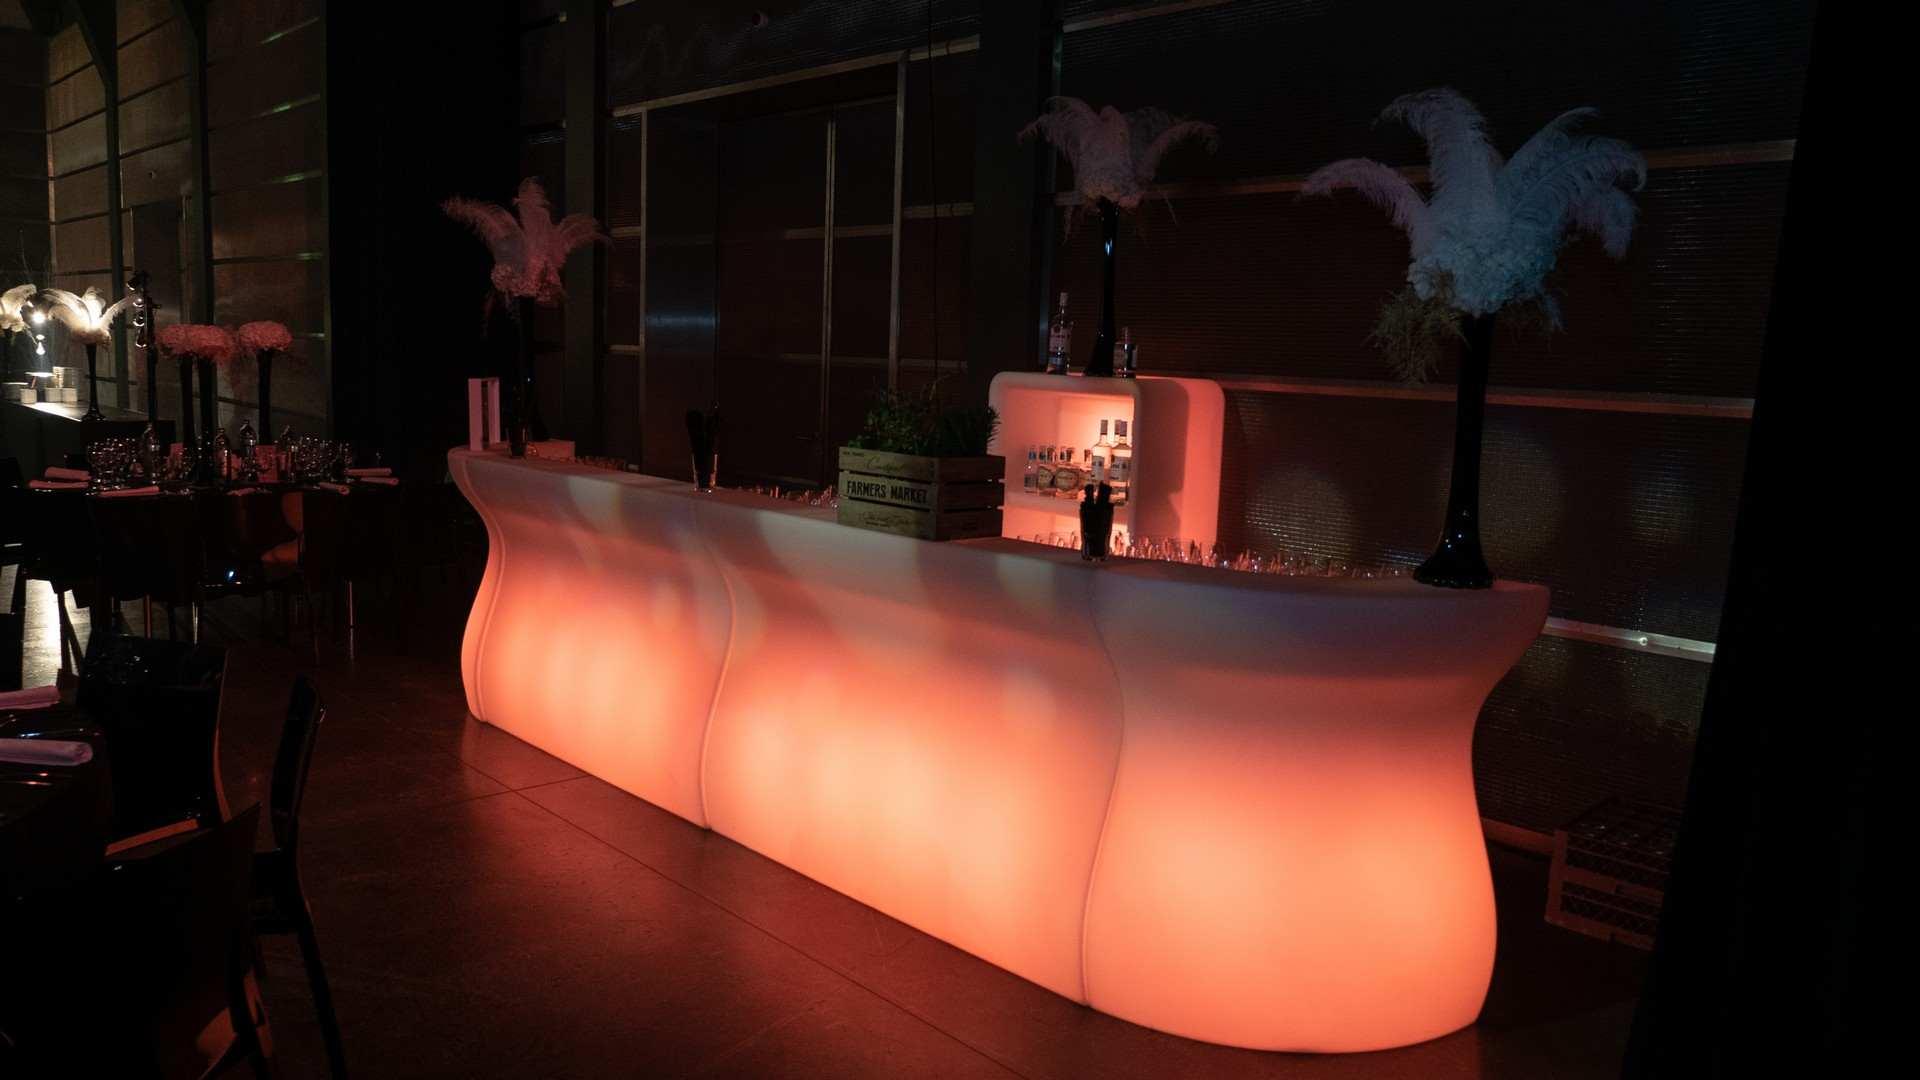 xmas-party-atoz-2018-evementiel-luxembourg-carte-blanche-project